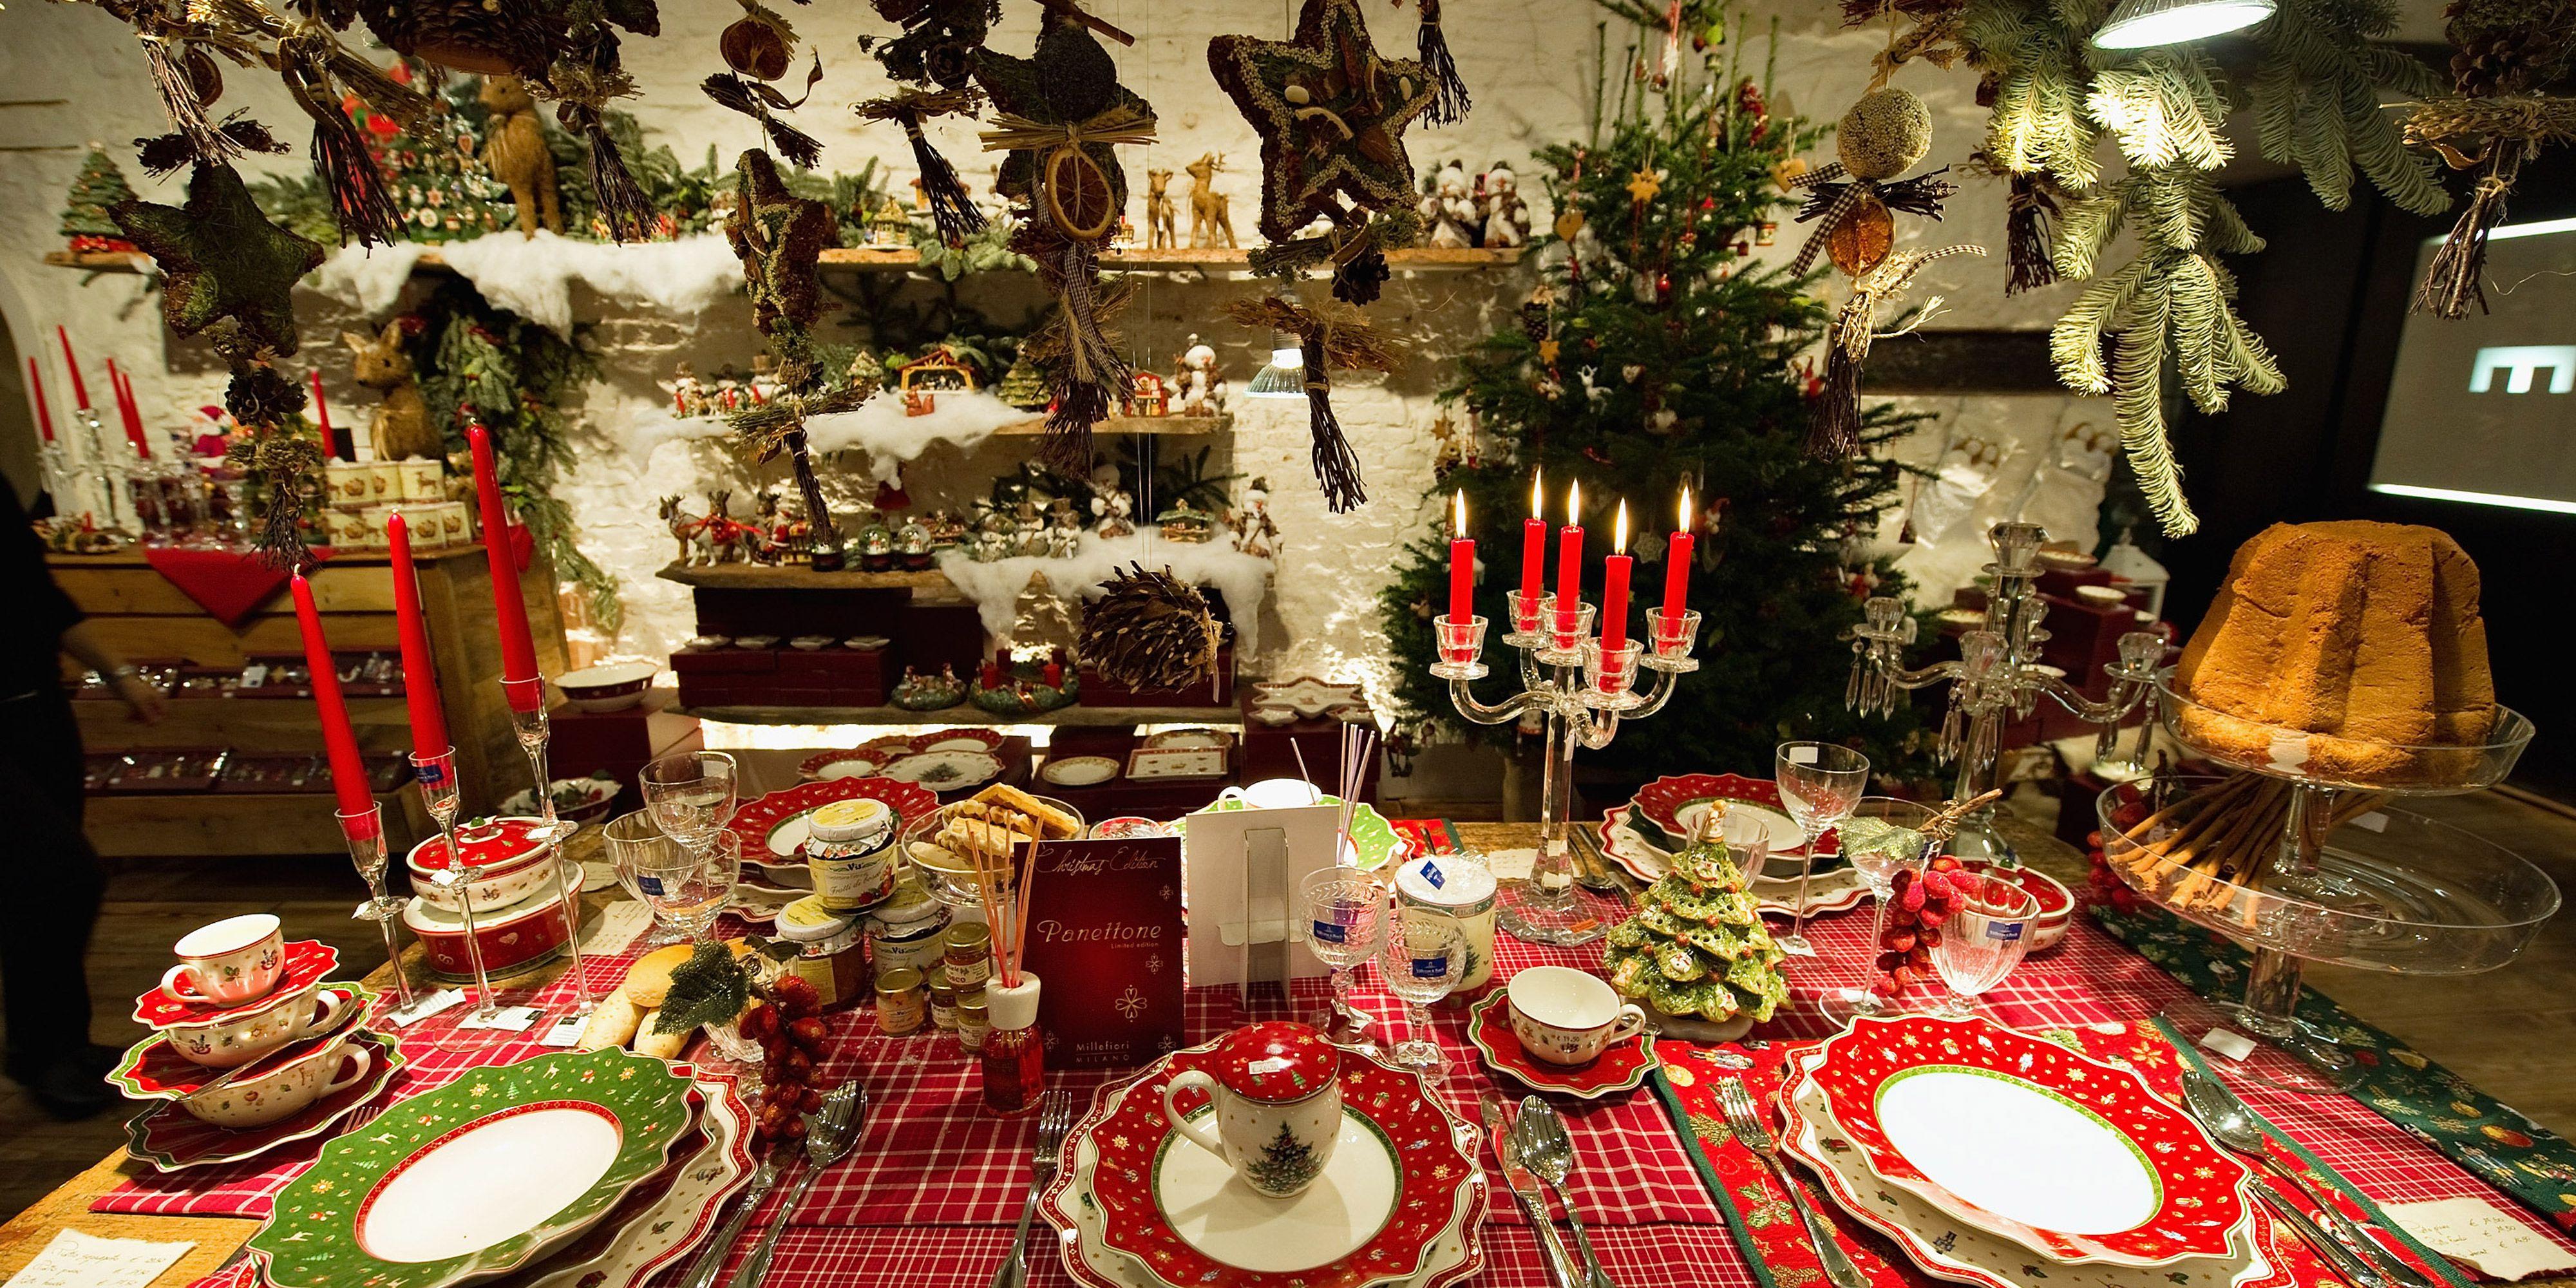 38 Elegant Christmas Table Settings , Stylish Holiday Table